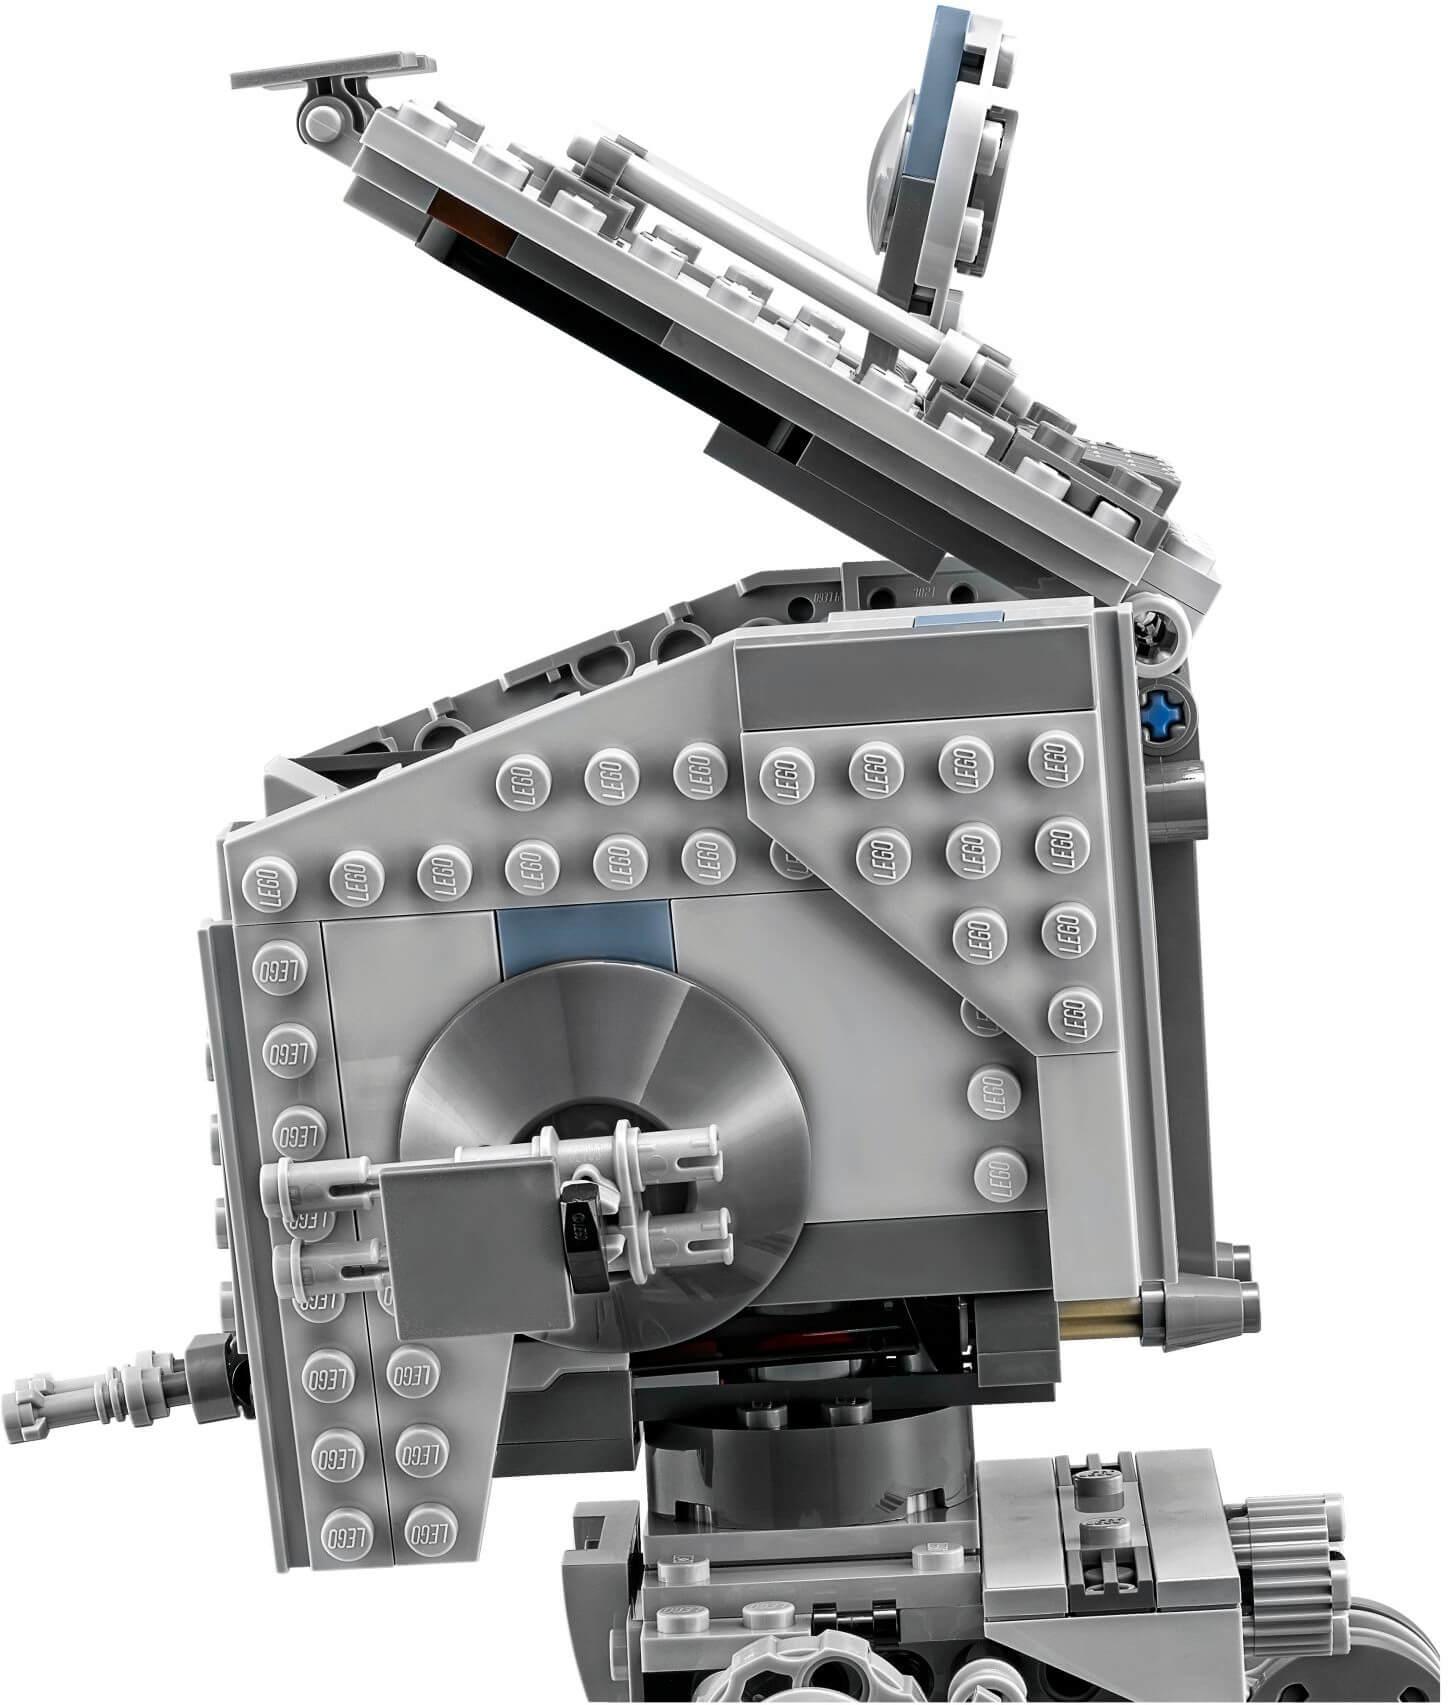 Mua đồ chơi LEGO 75153 - LEGO Star Wars 75153 - AT-ST Walker (LEGO Star Wars AT-ST Walker 75153)